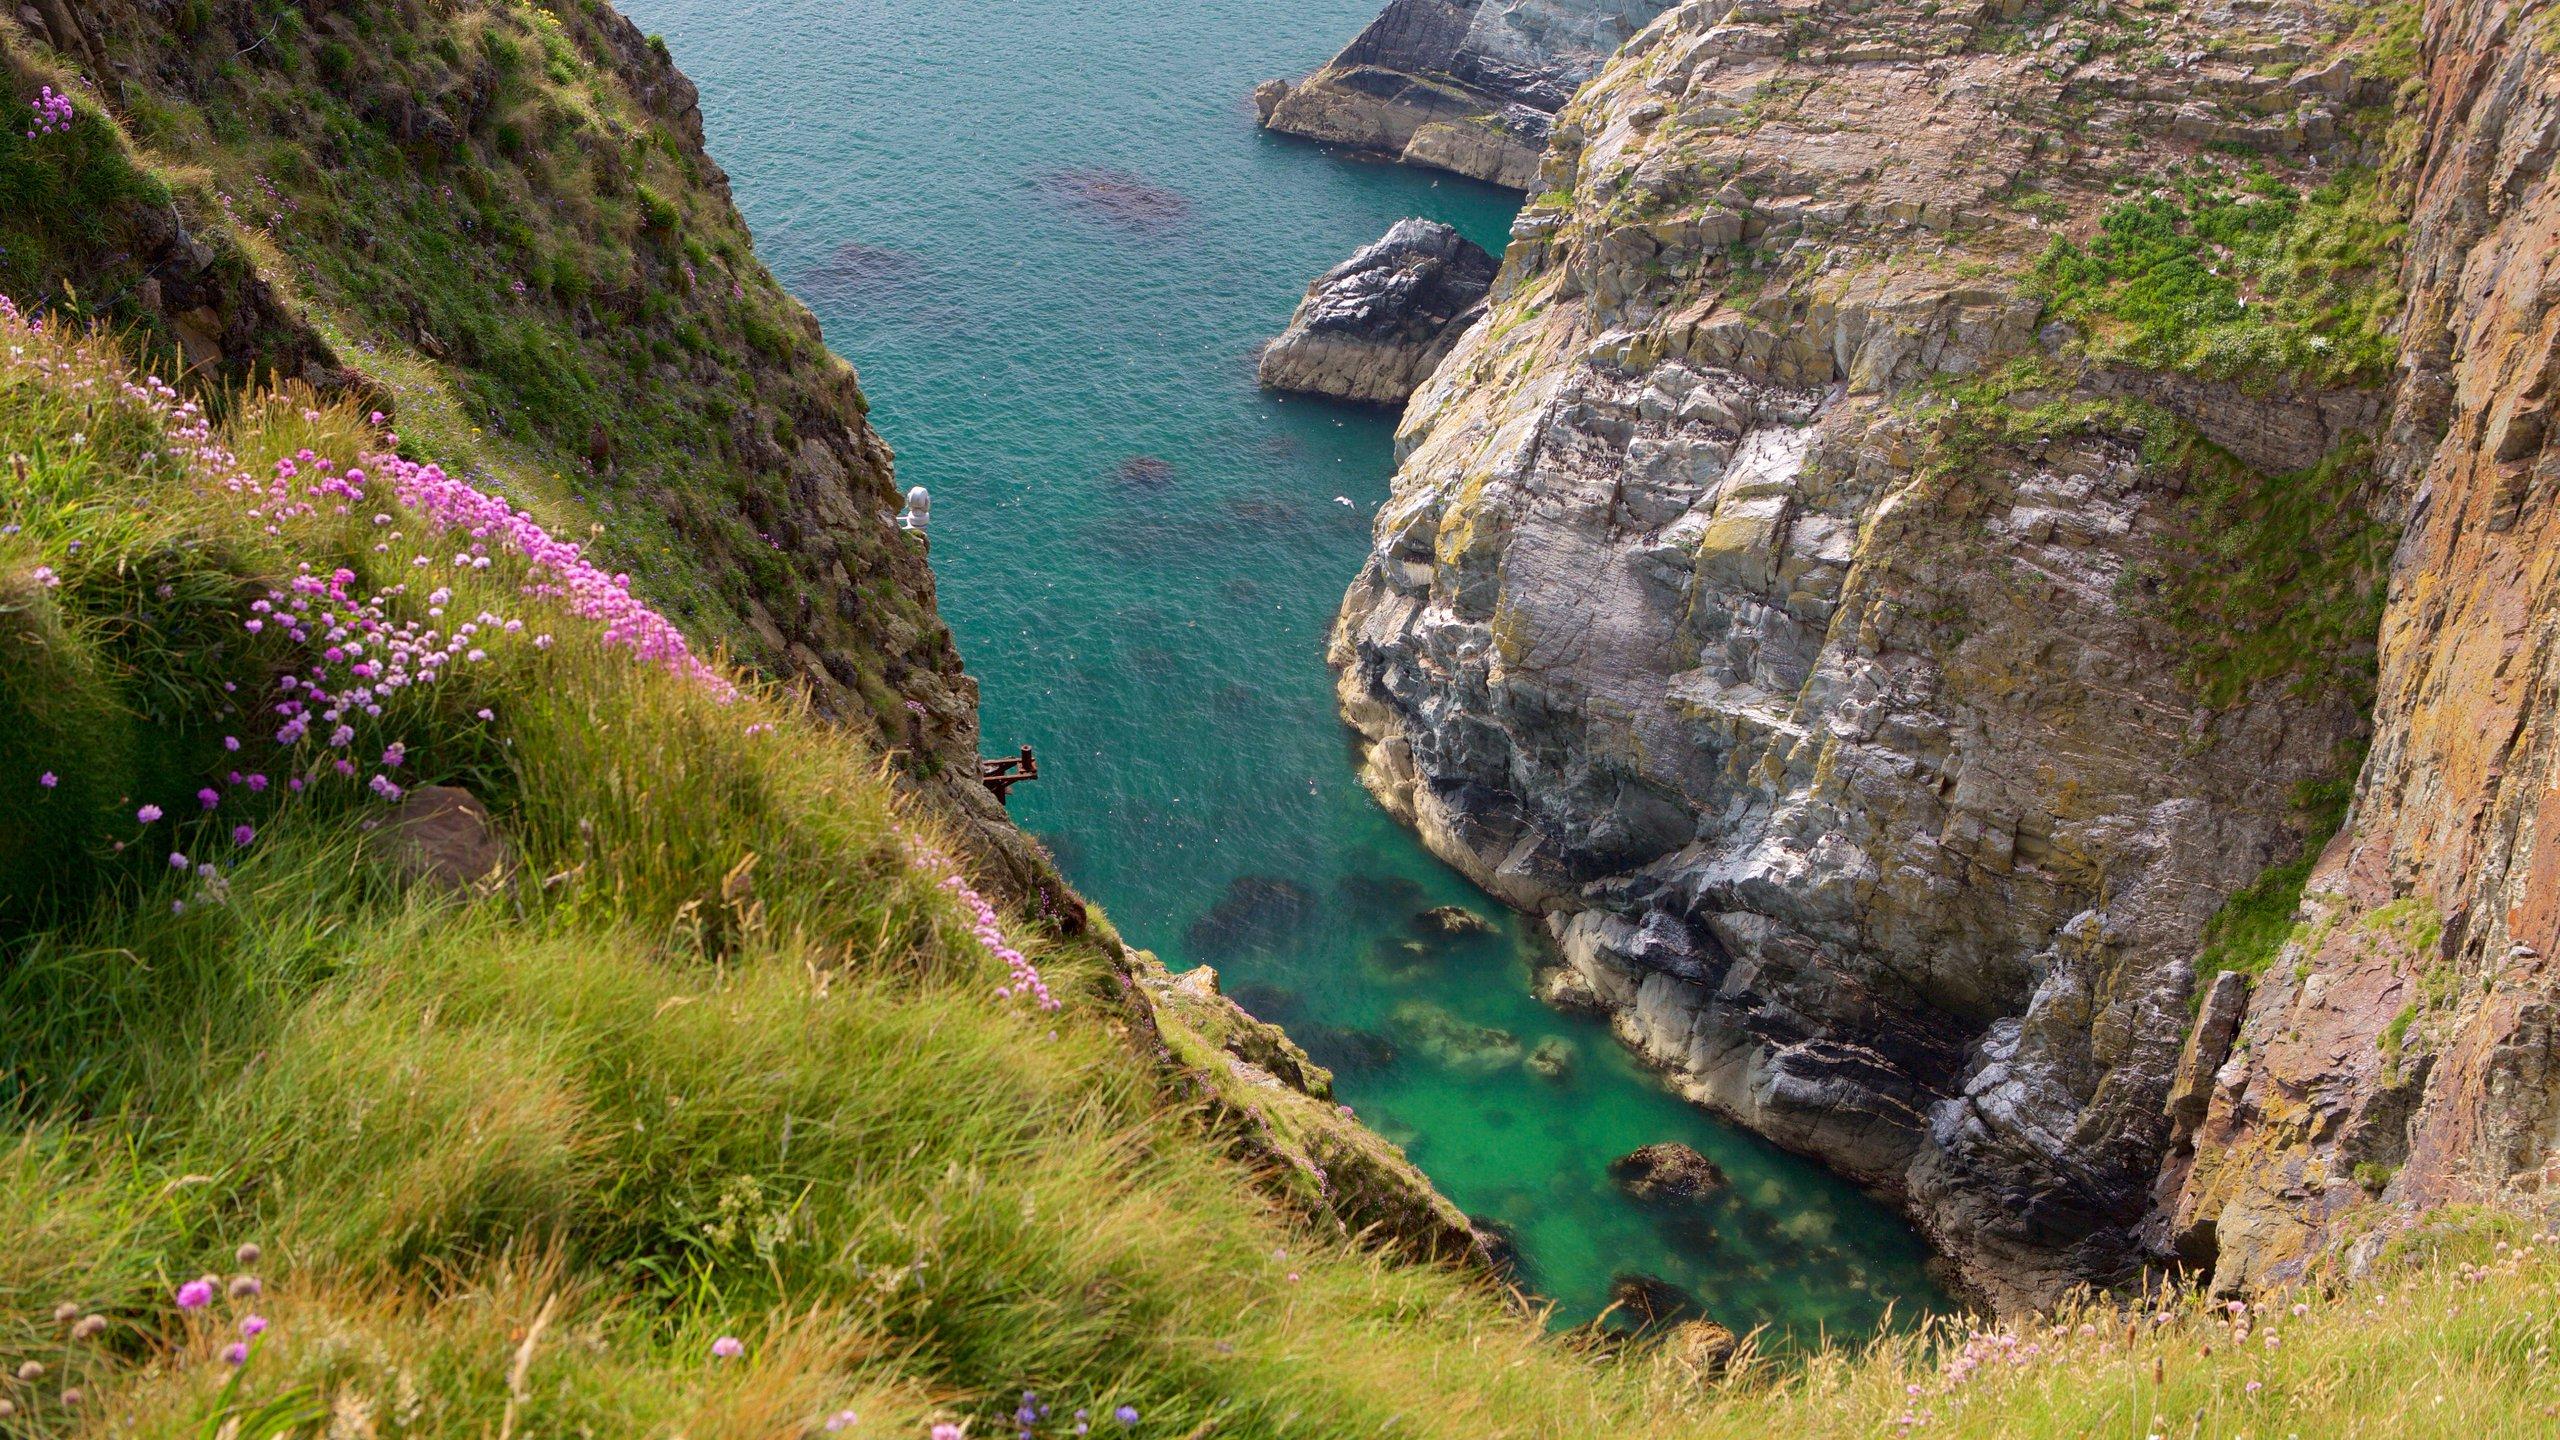 Isle of Anglesey, Wales, United Kingdom